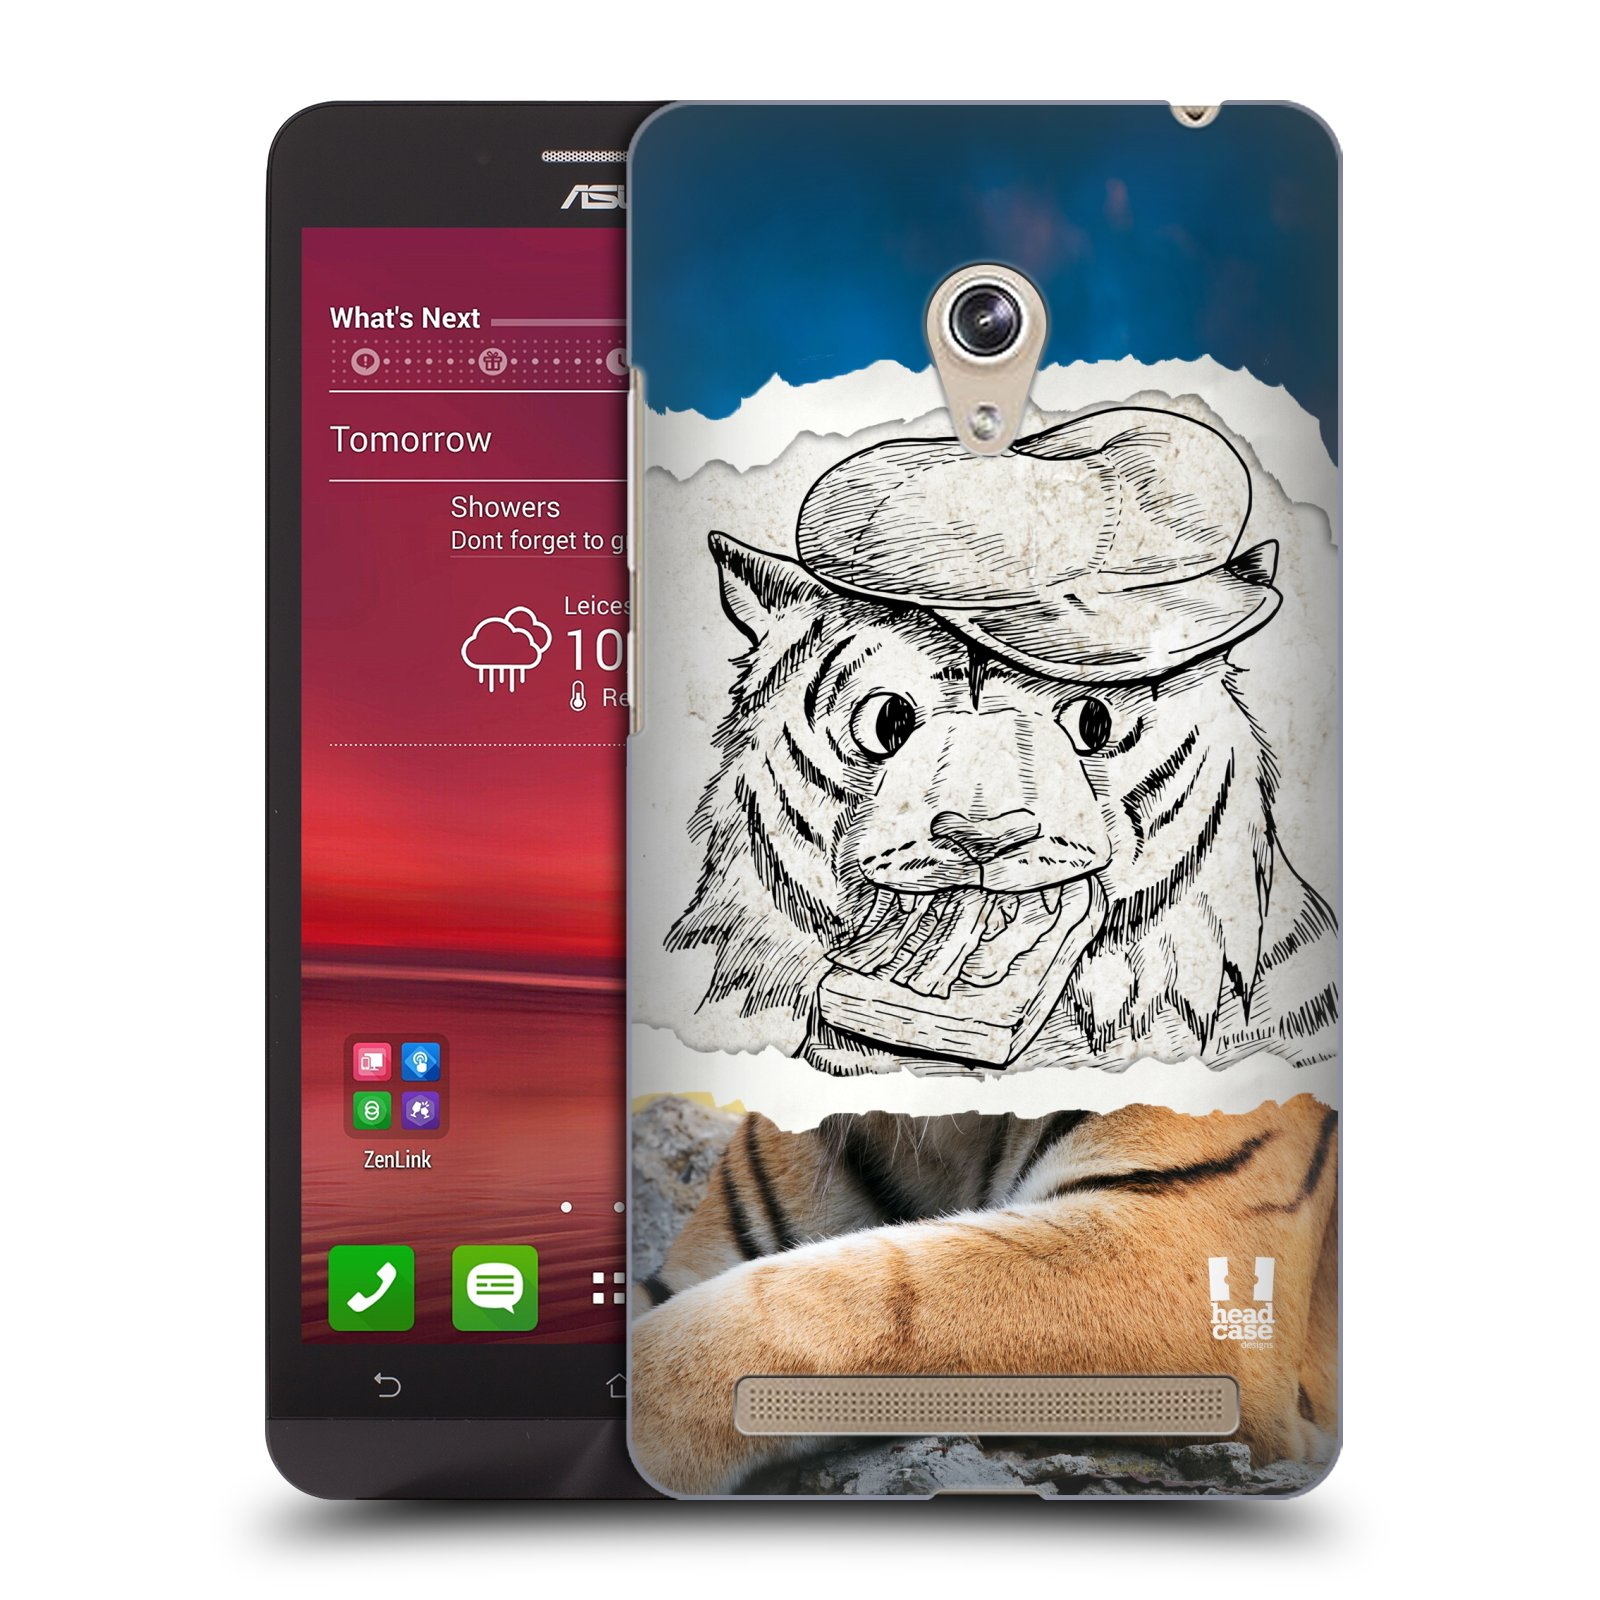 HEAD CASE plastový obal na mobil Asus Zenfone 6 vzor zvířata koláž tygr fešák